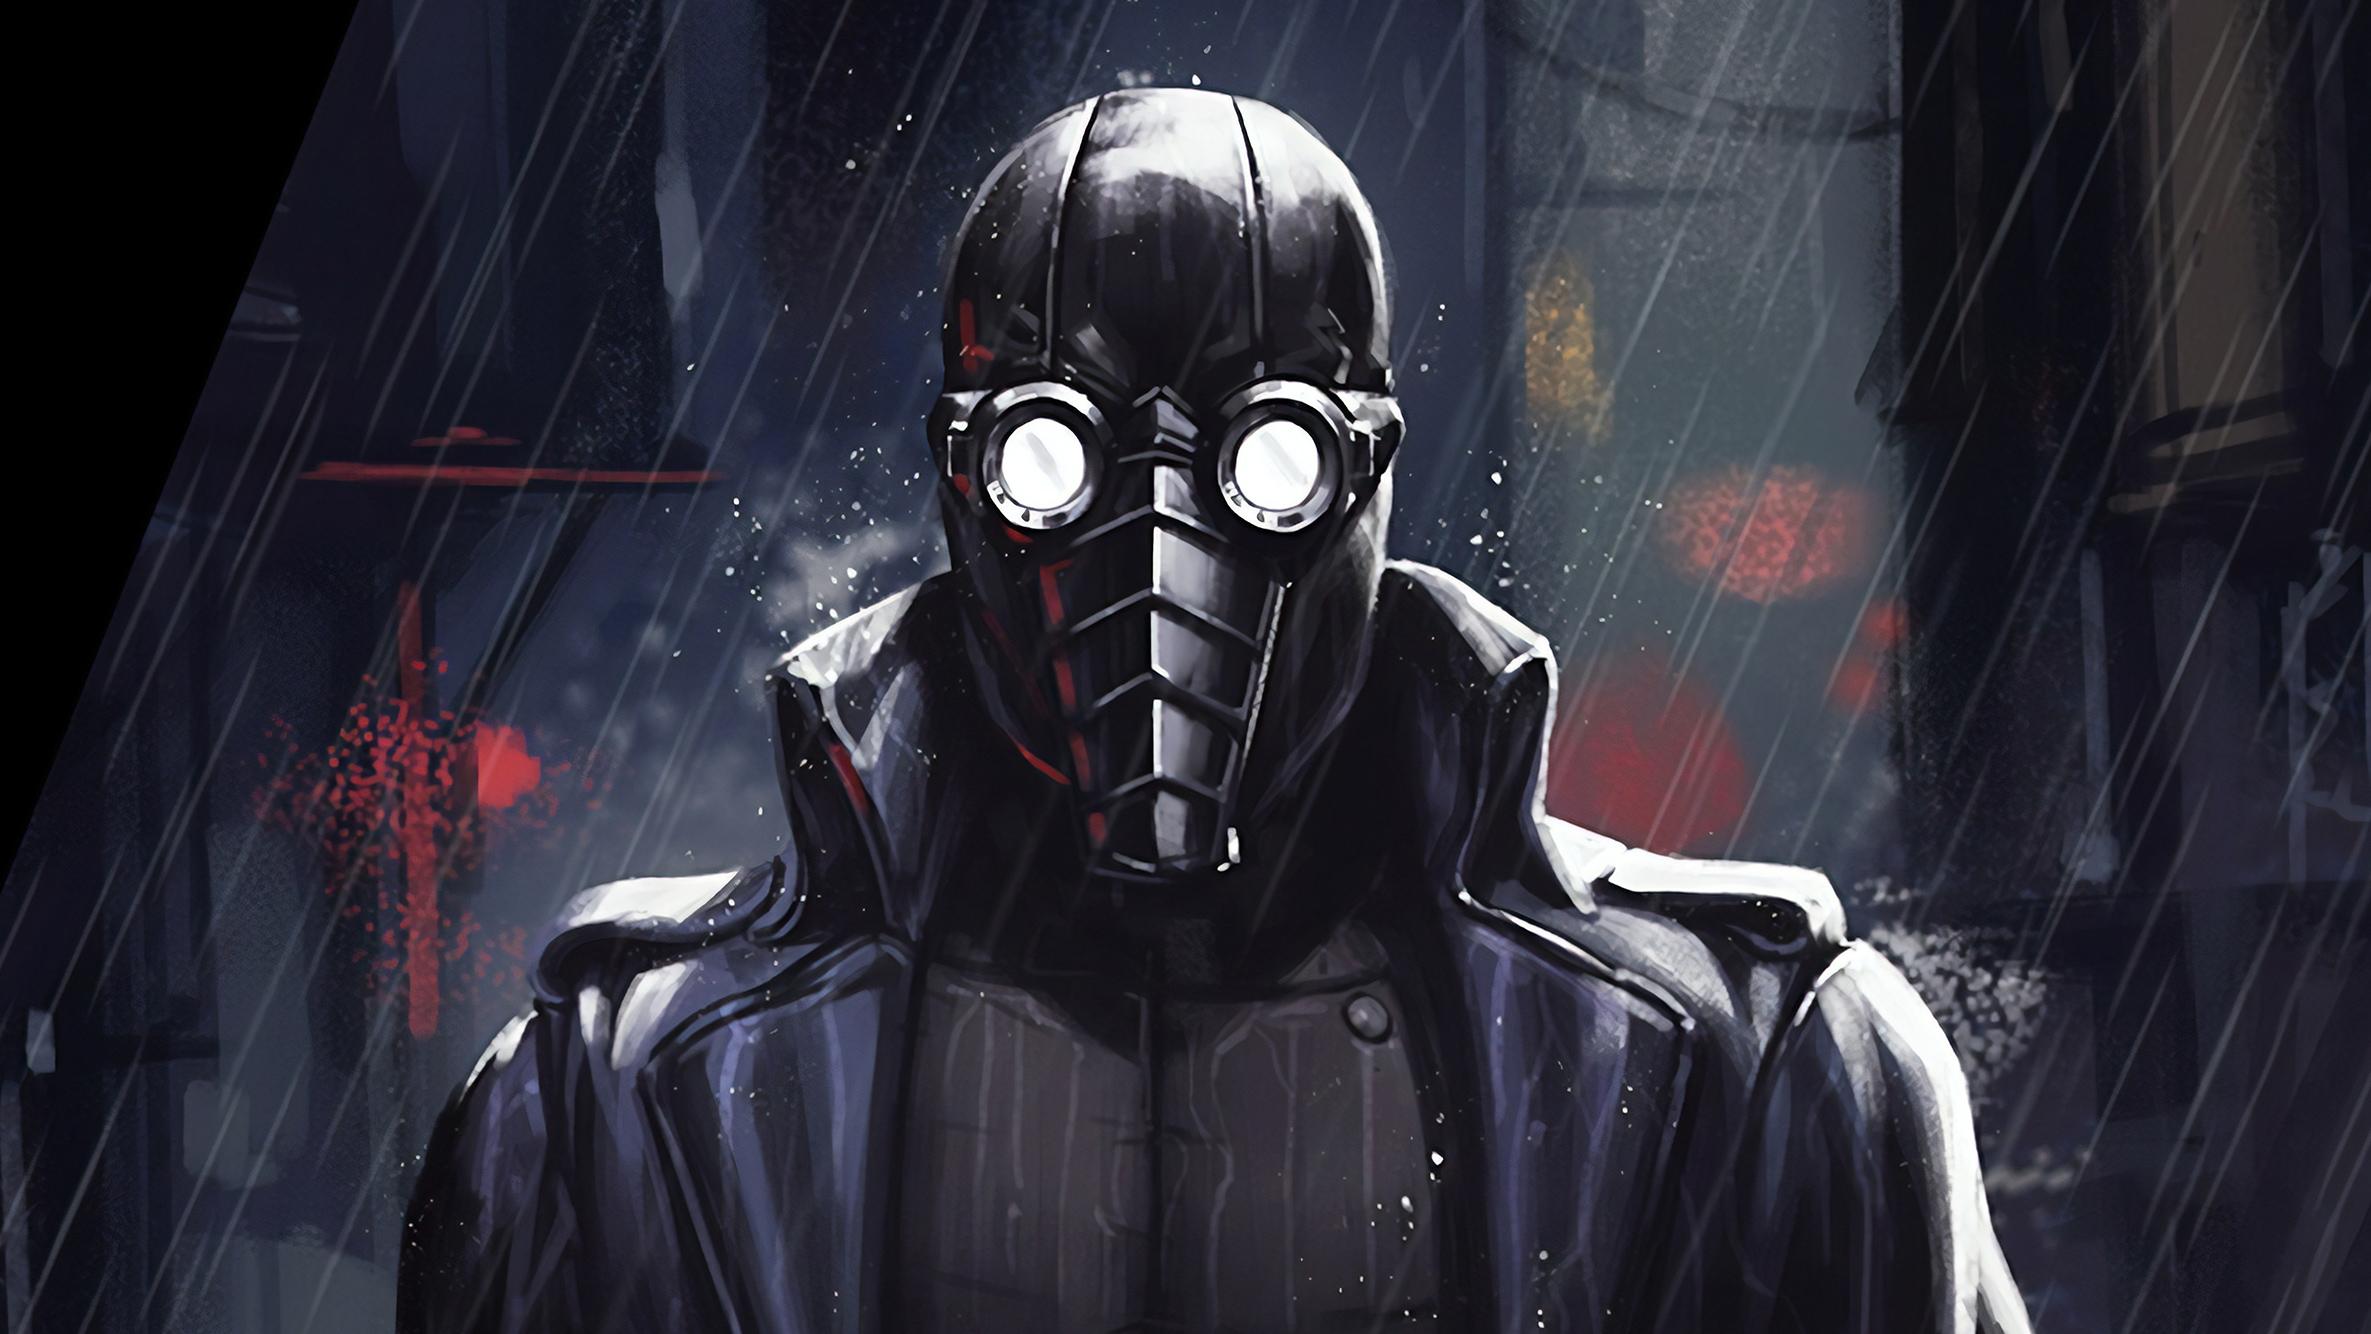 Spider Man Noir Hd Hd Superheroes 4k Wallpapers Images